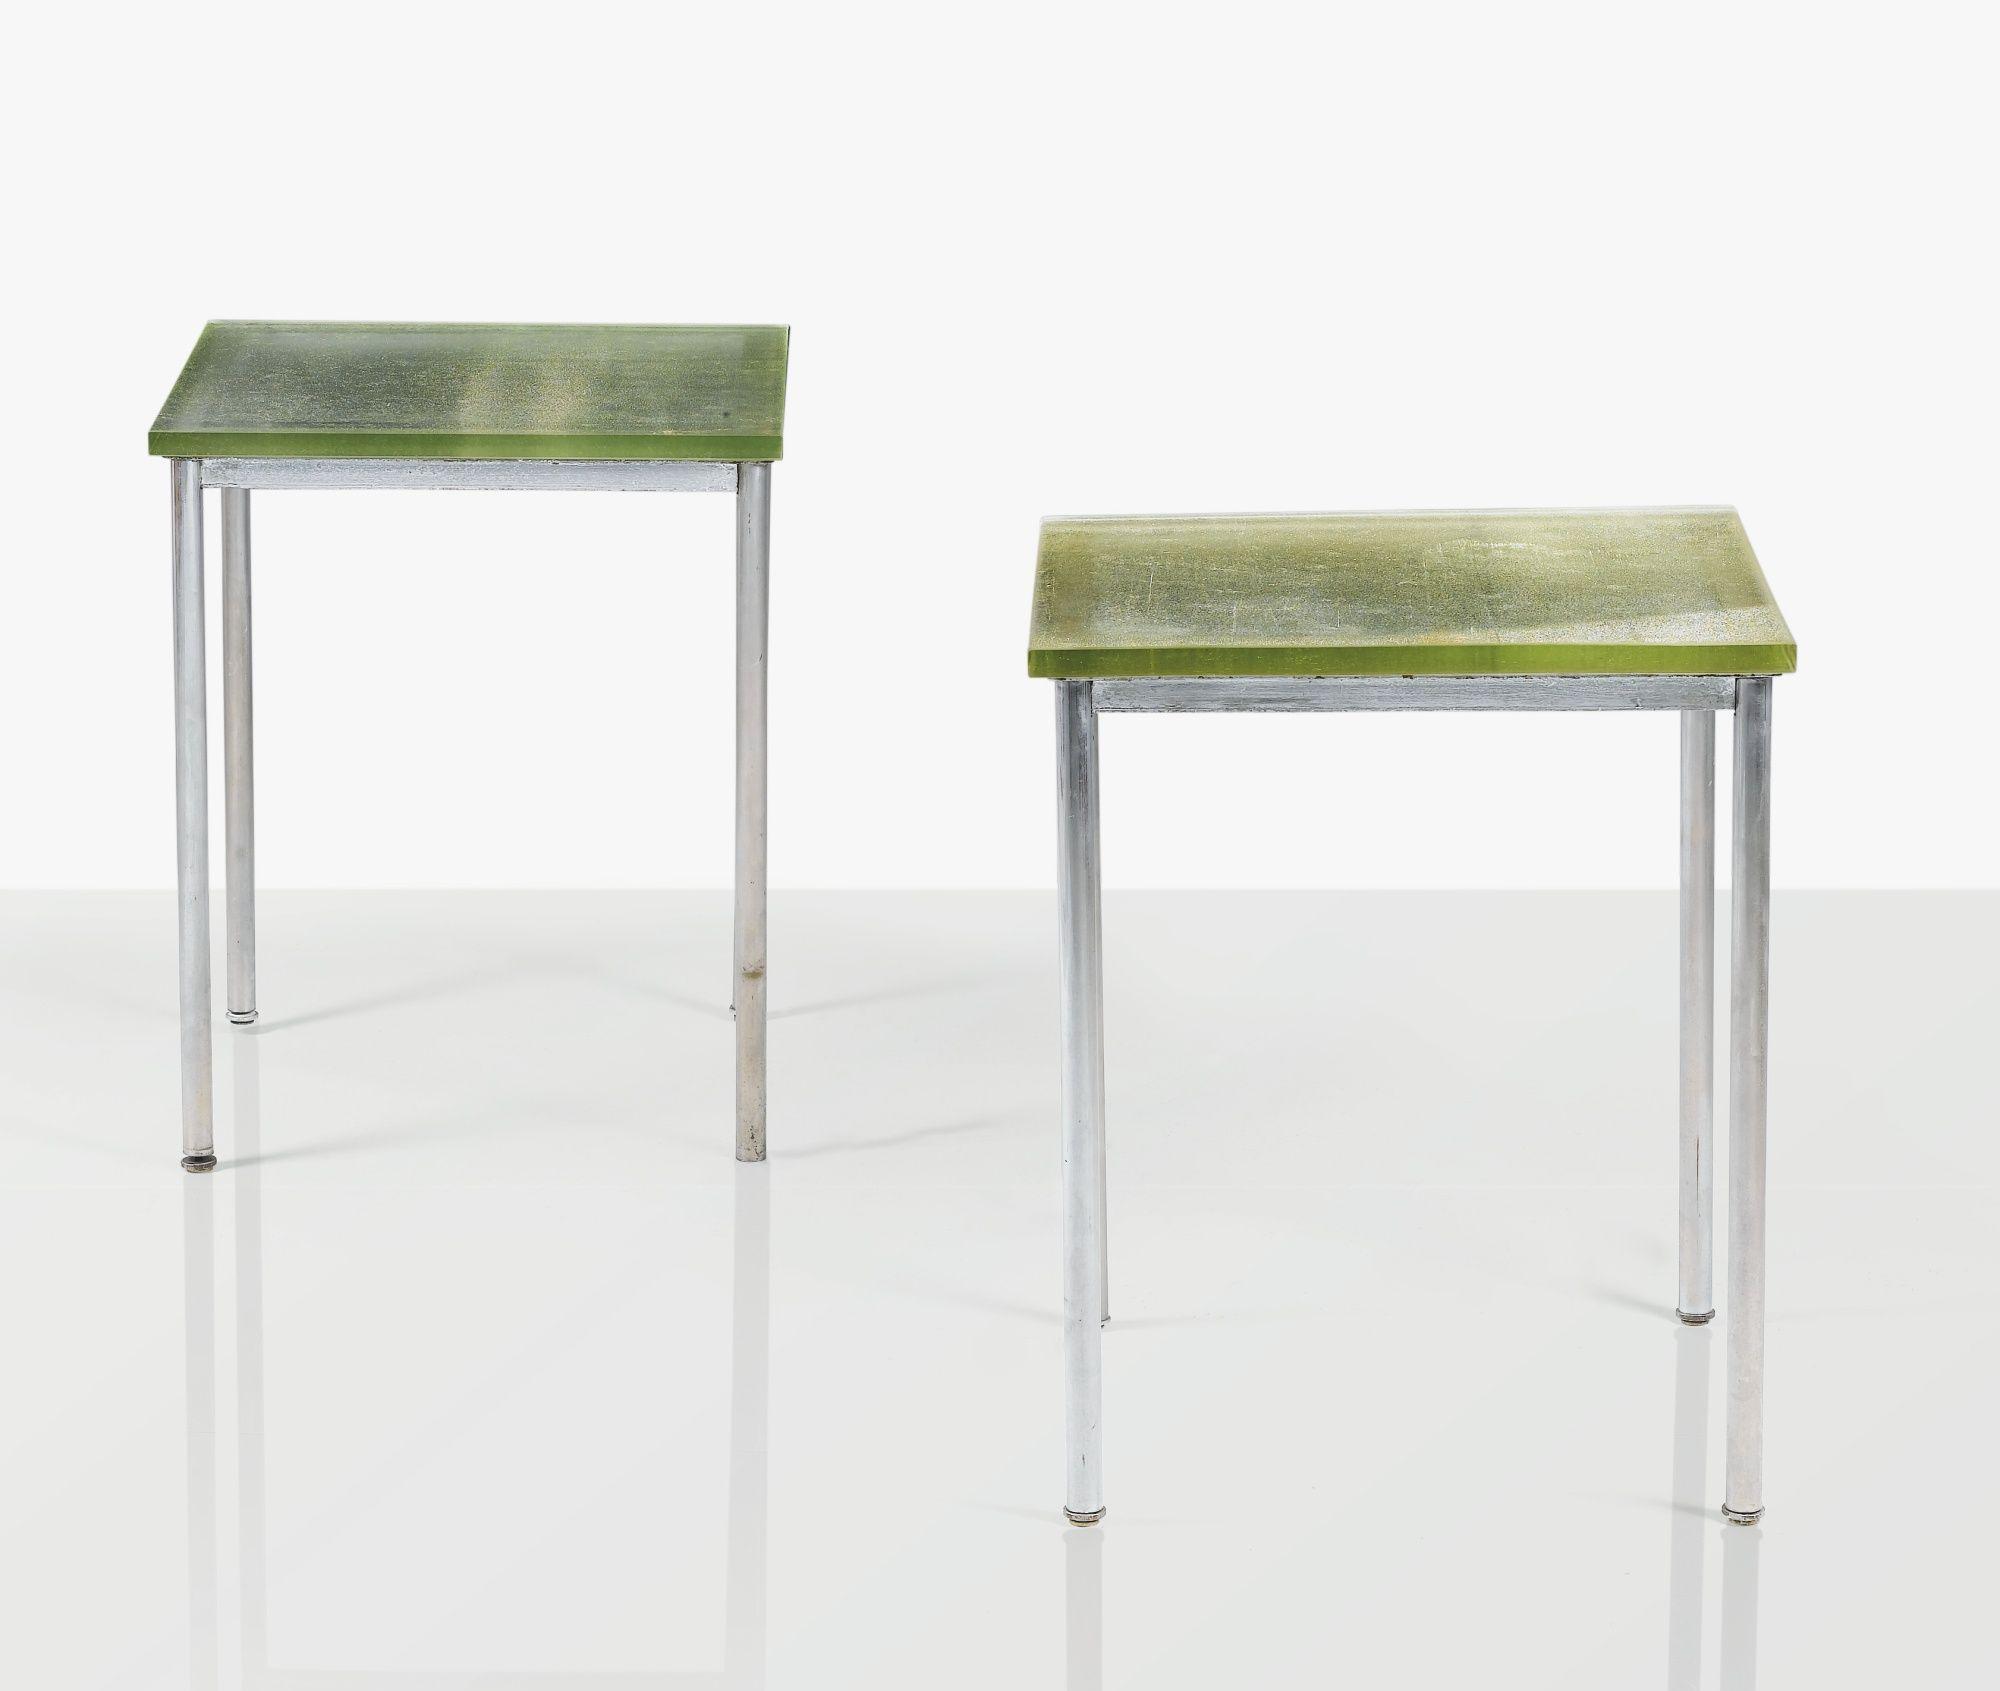 0d27d70e513b60cb72b22295ffb20e7e Impressionnant De Table Bar Exterieur Conception